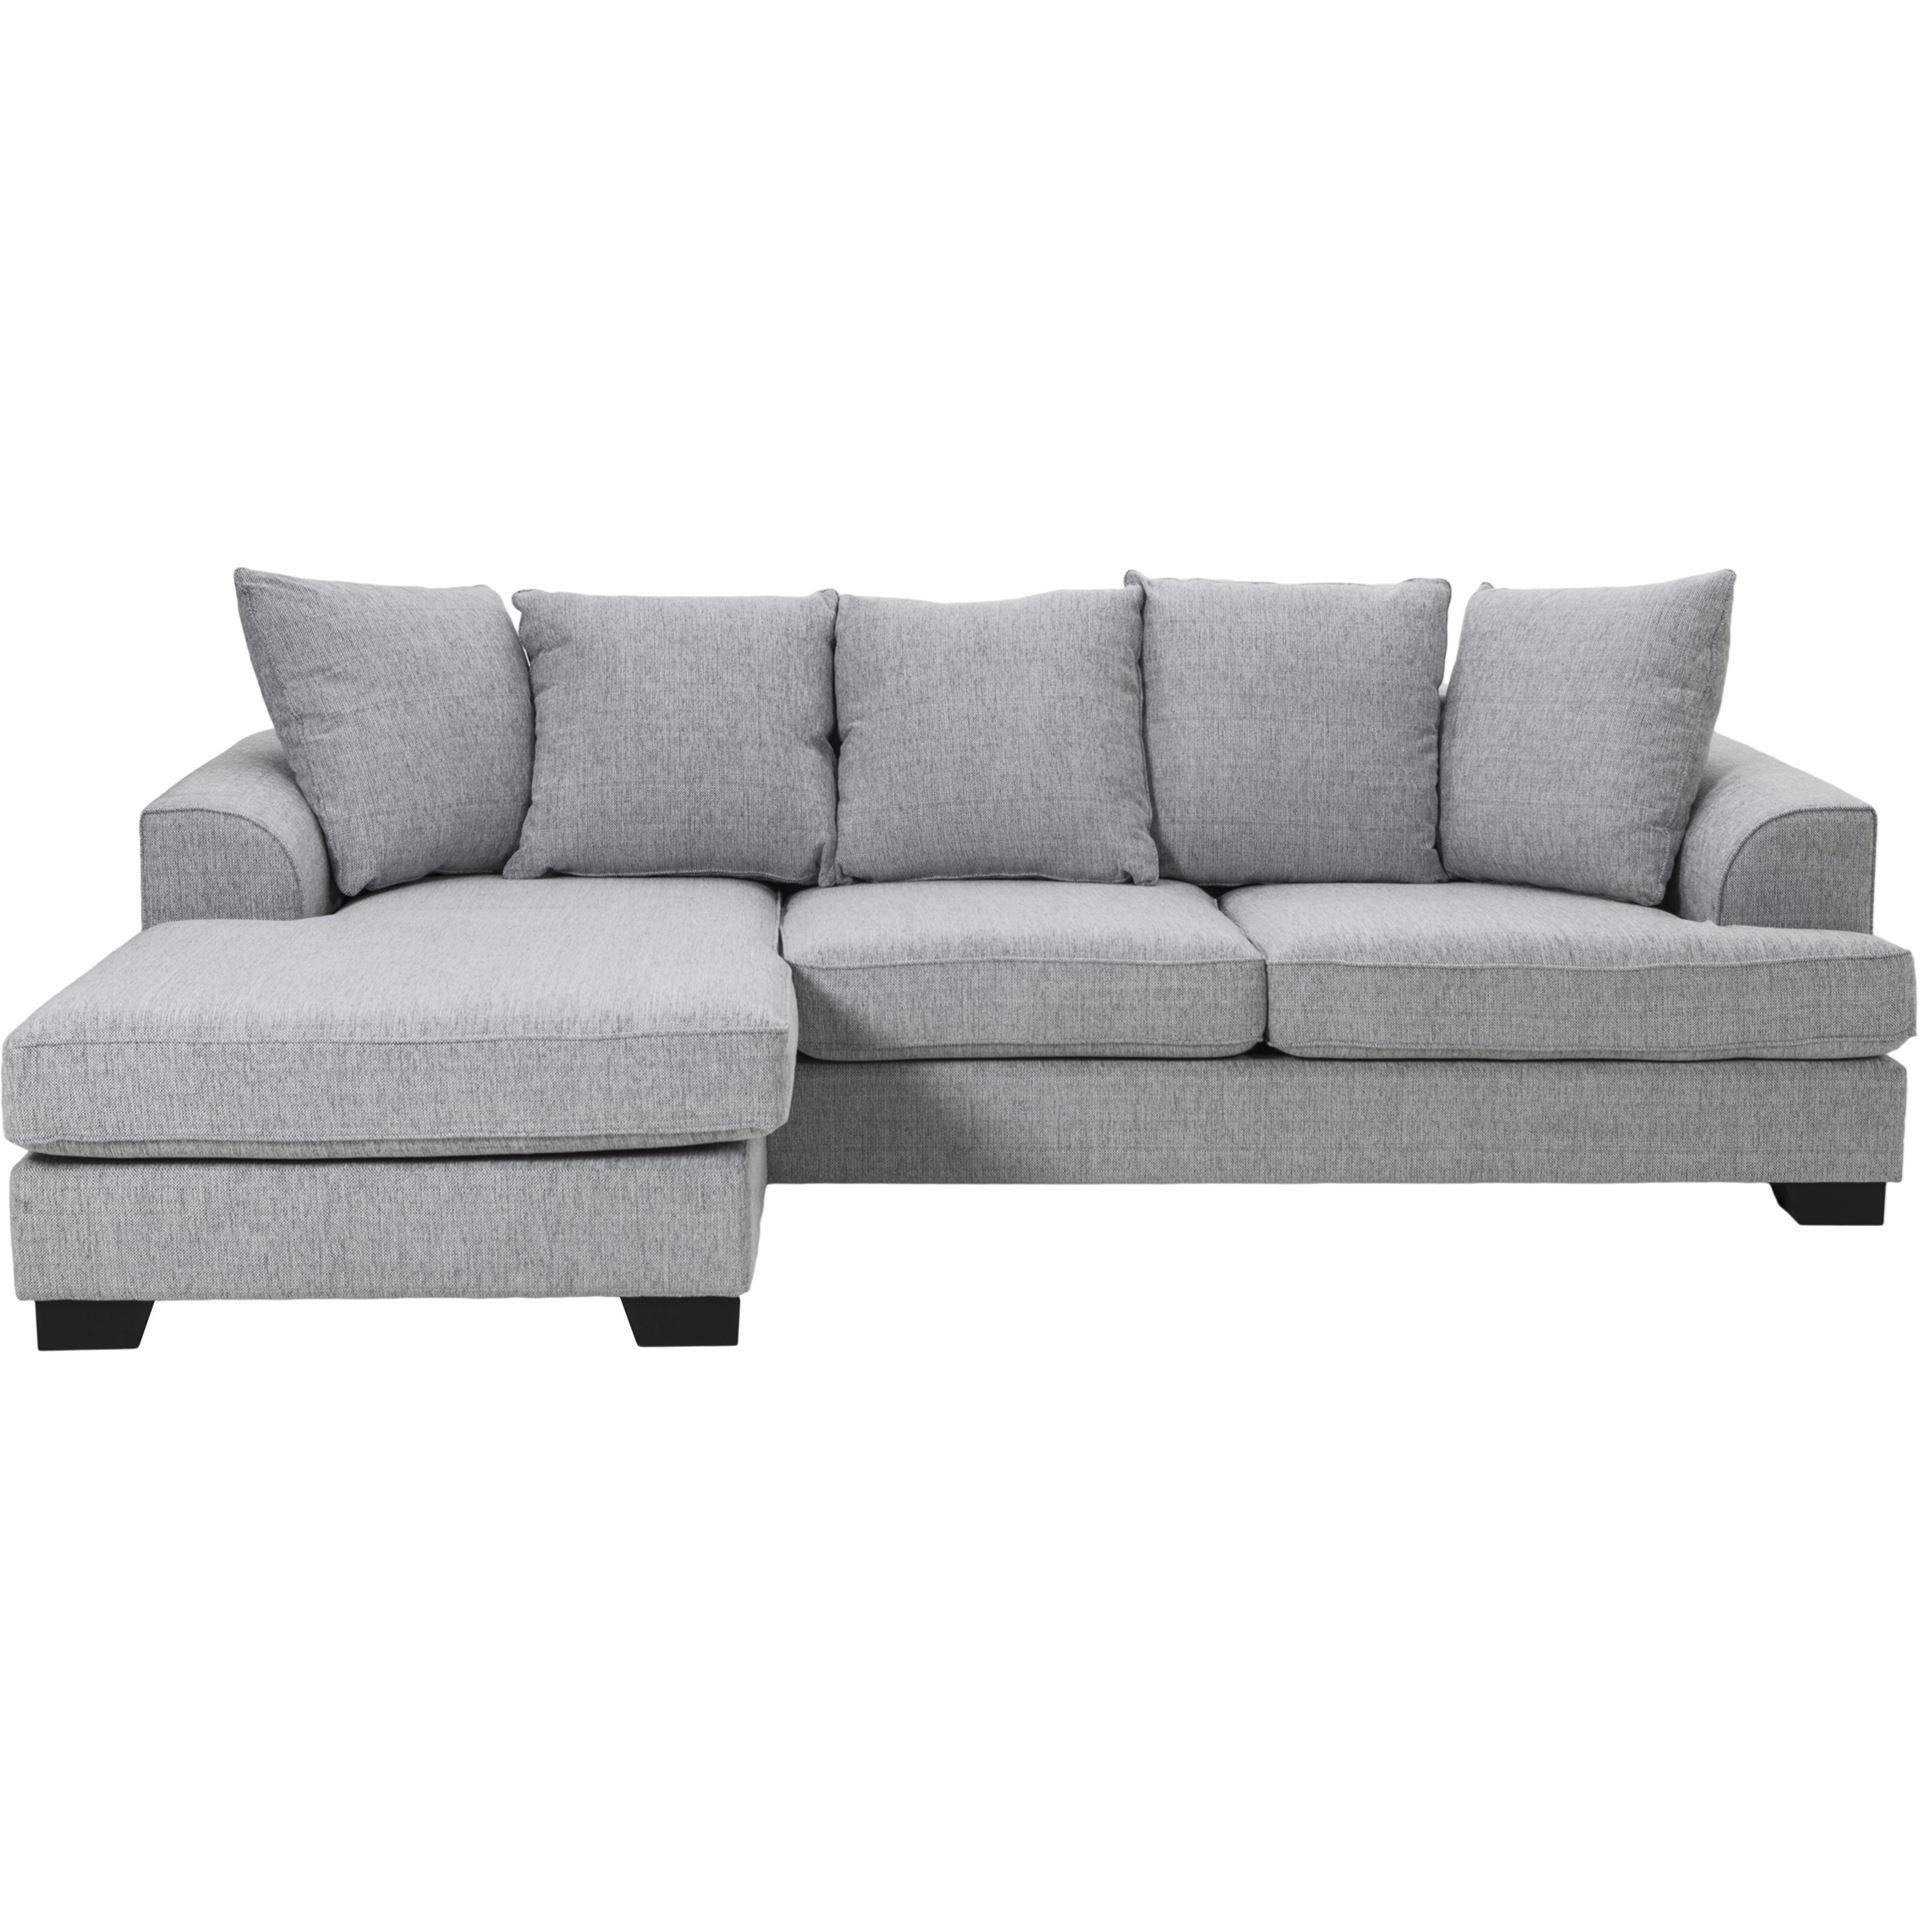 Kingston Sofa 2 5 Chaise Lounge Left